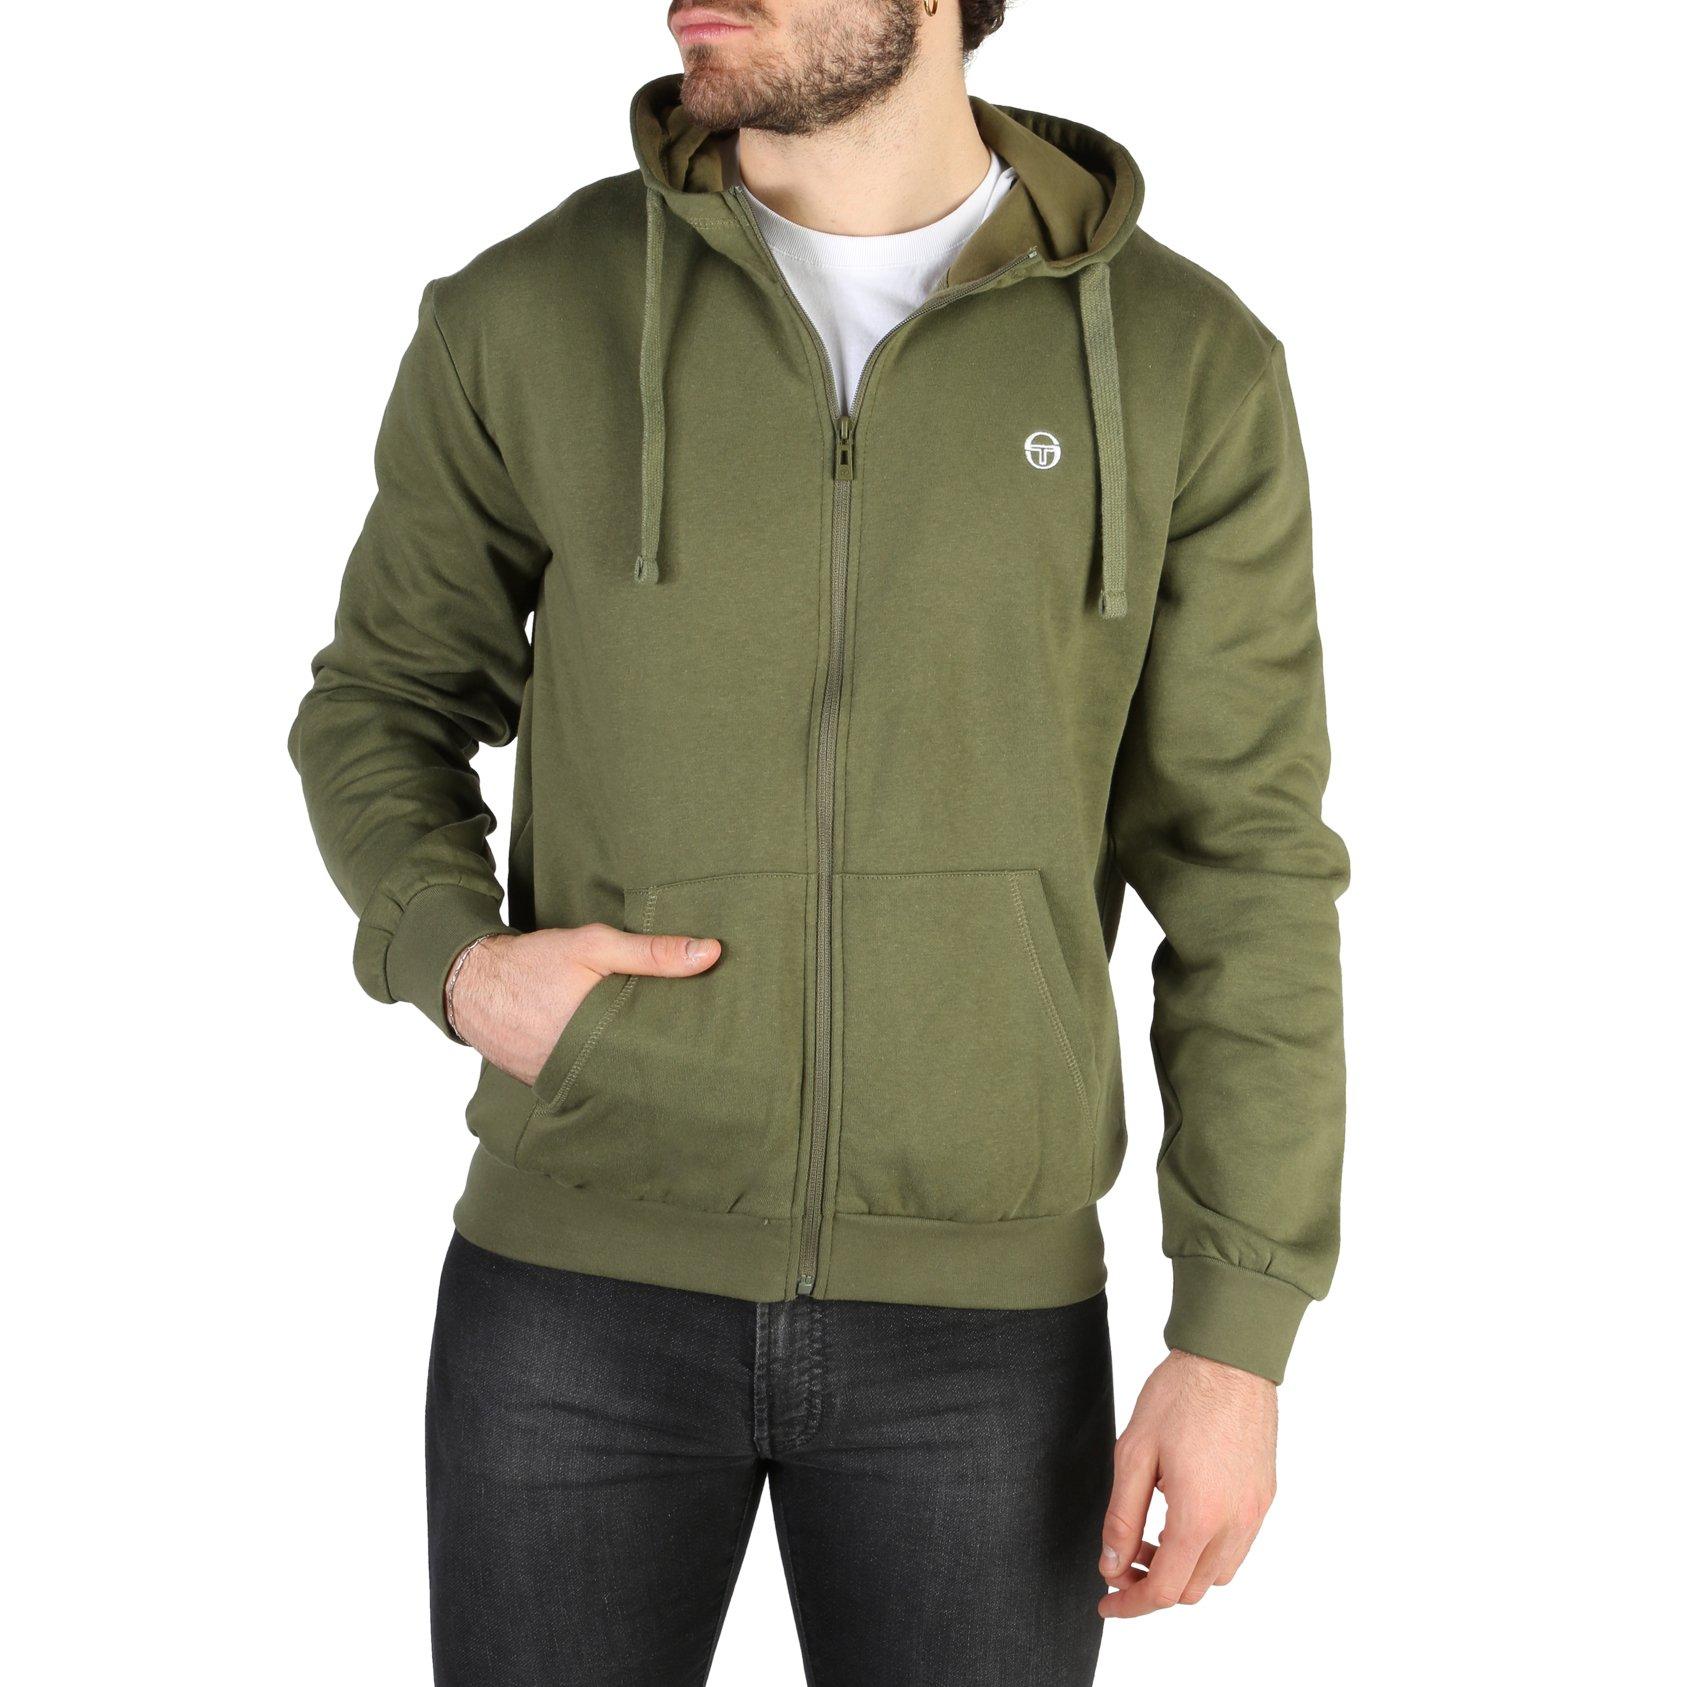 Sergio Tacchini Men's Sweatshirt Various Colours 103-10001 - green M